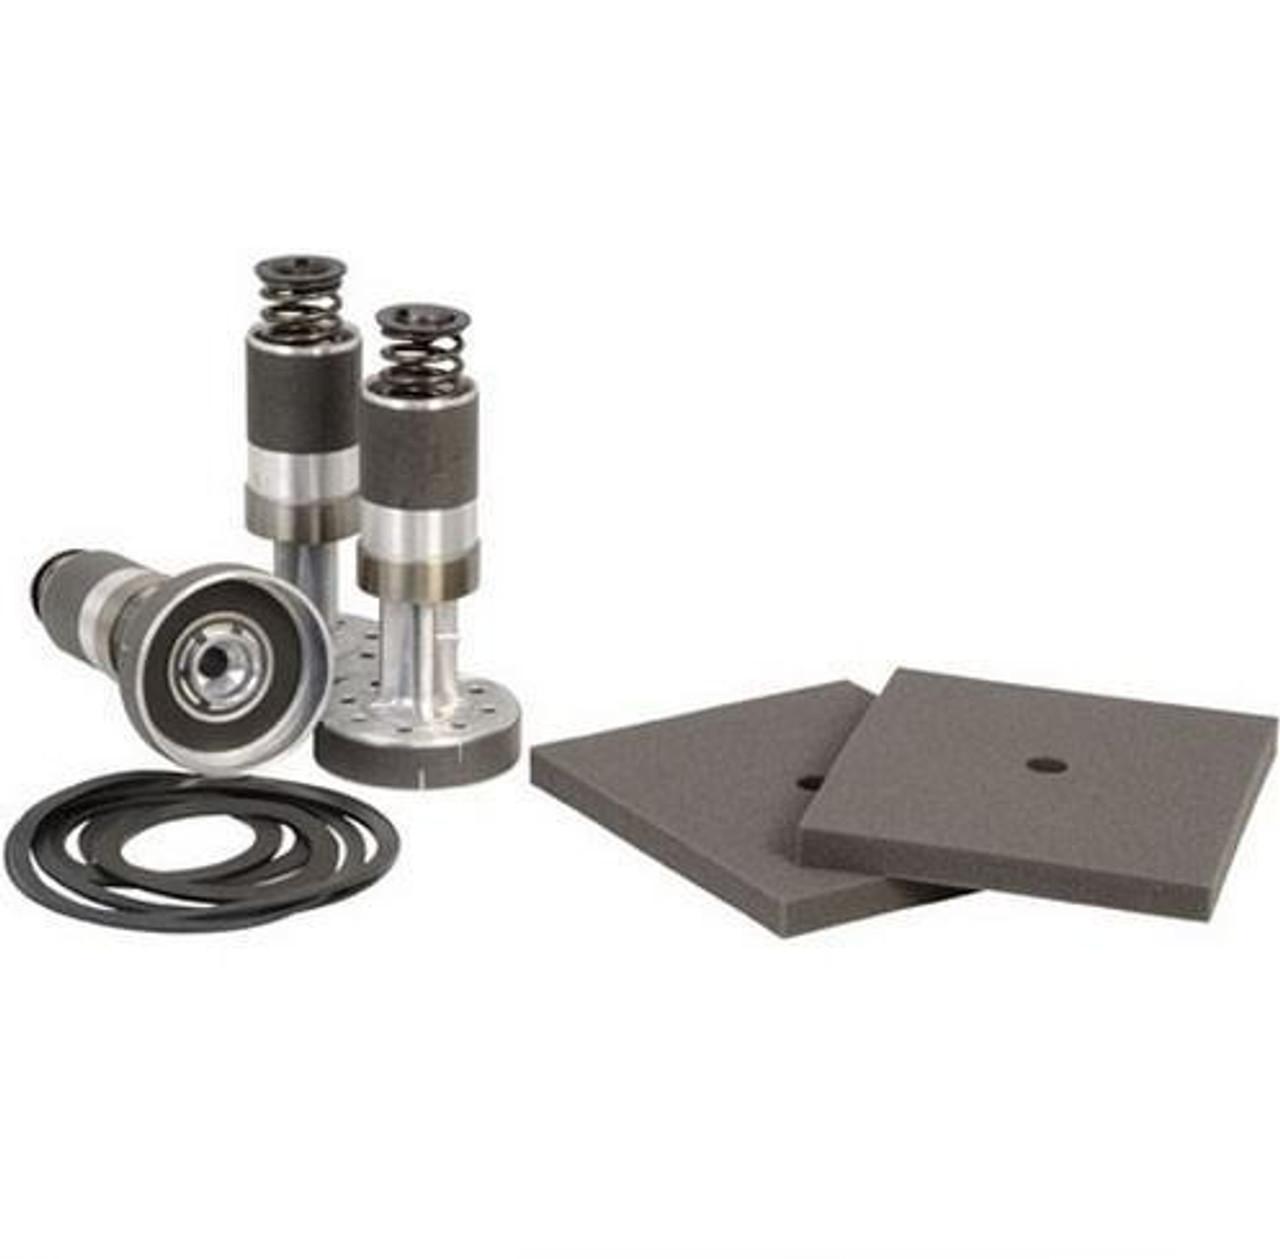 EasyPro Linear Piston Compressors Parts